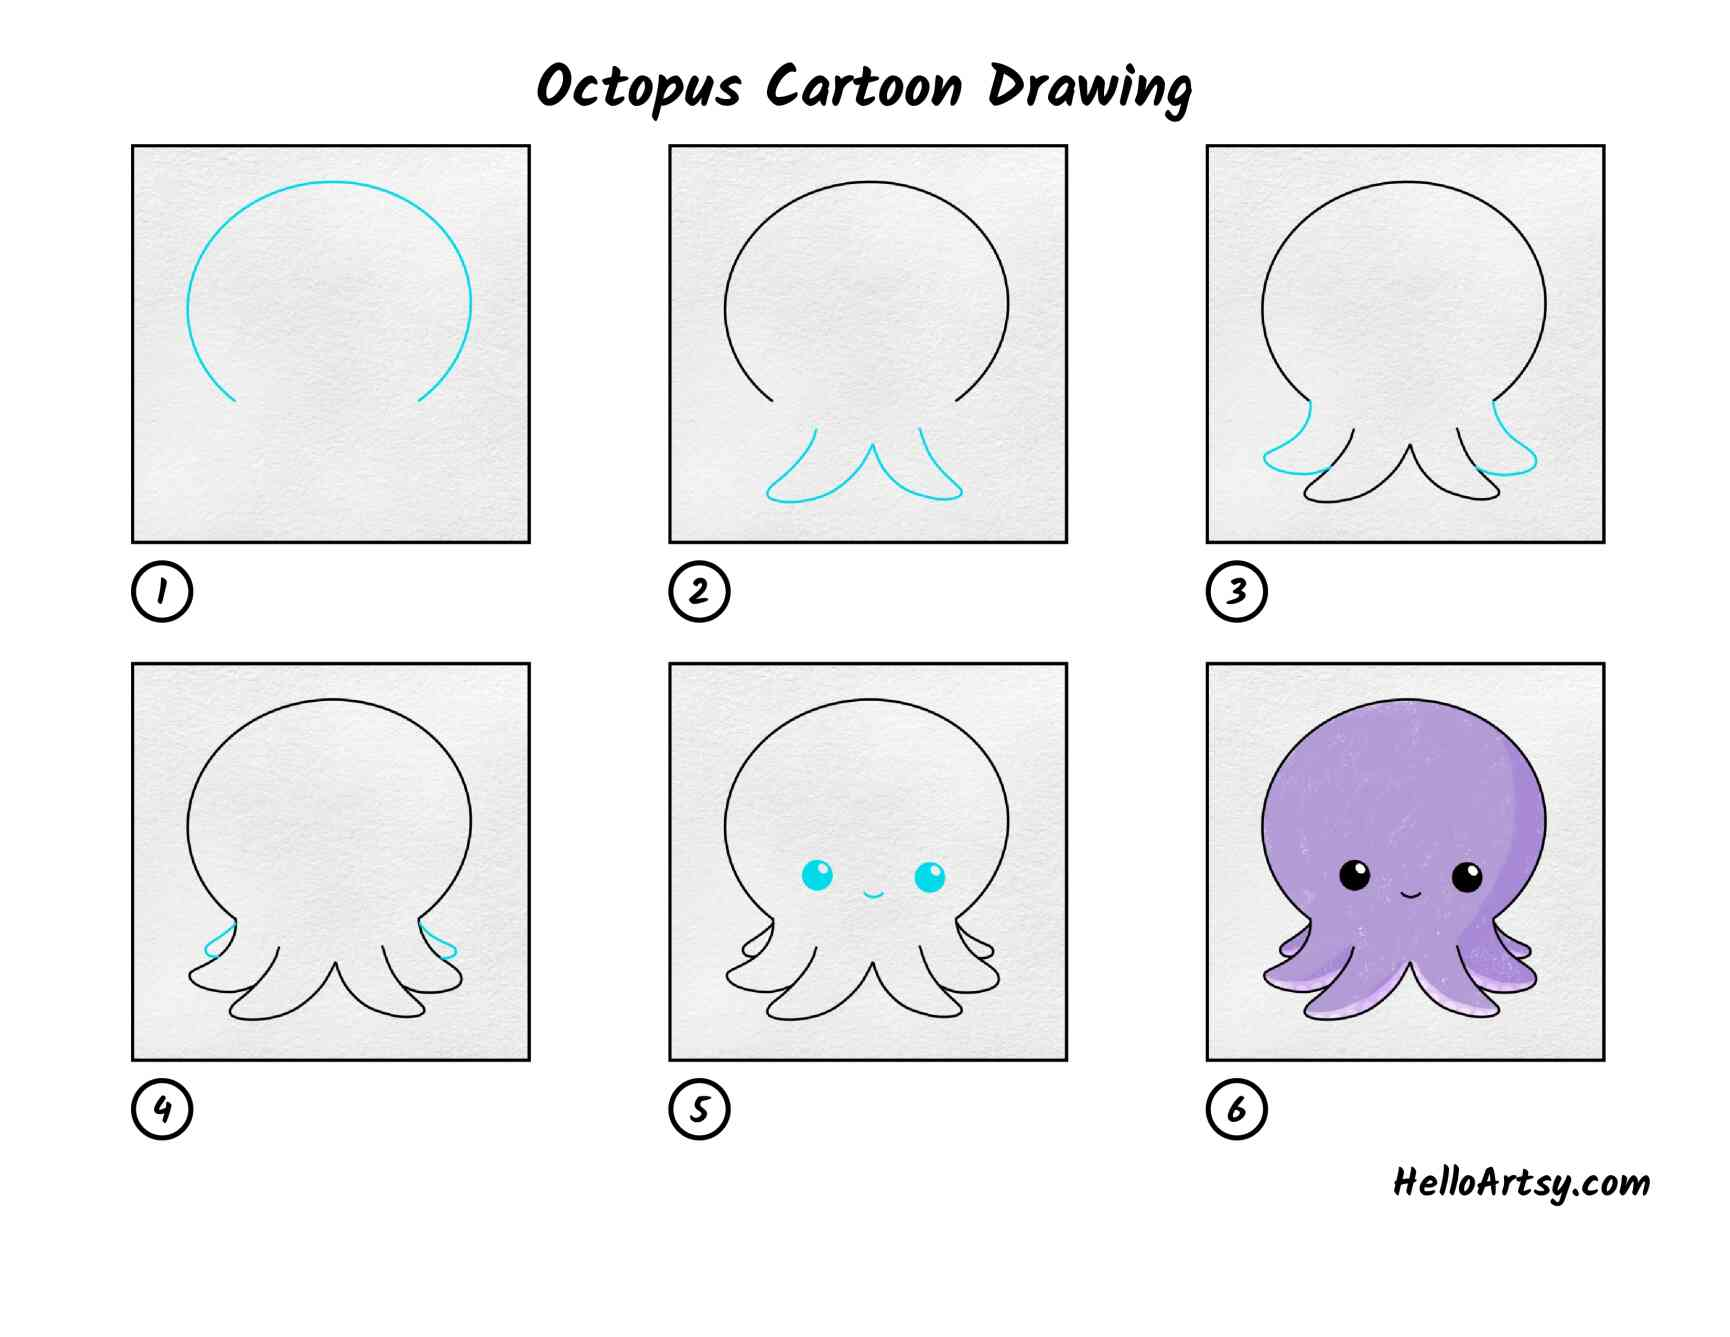 Octopus Cartoon Drawing: All Steps